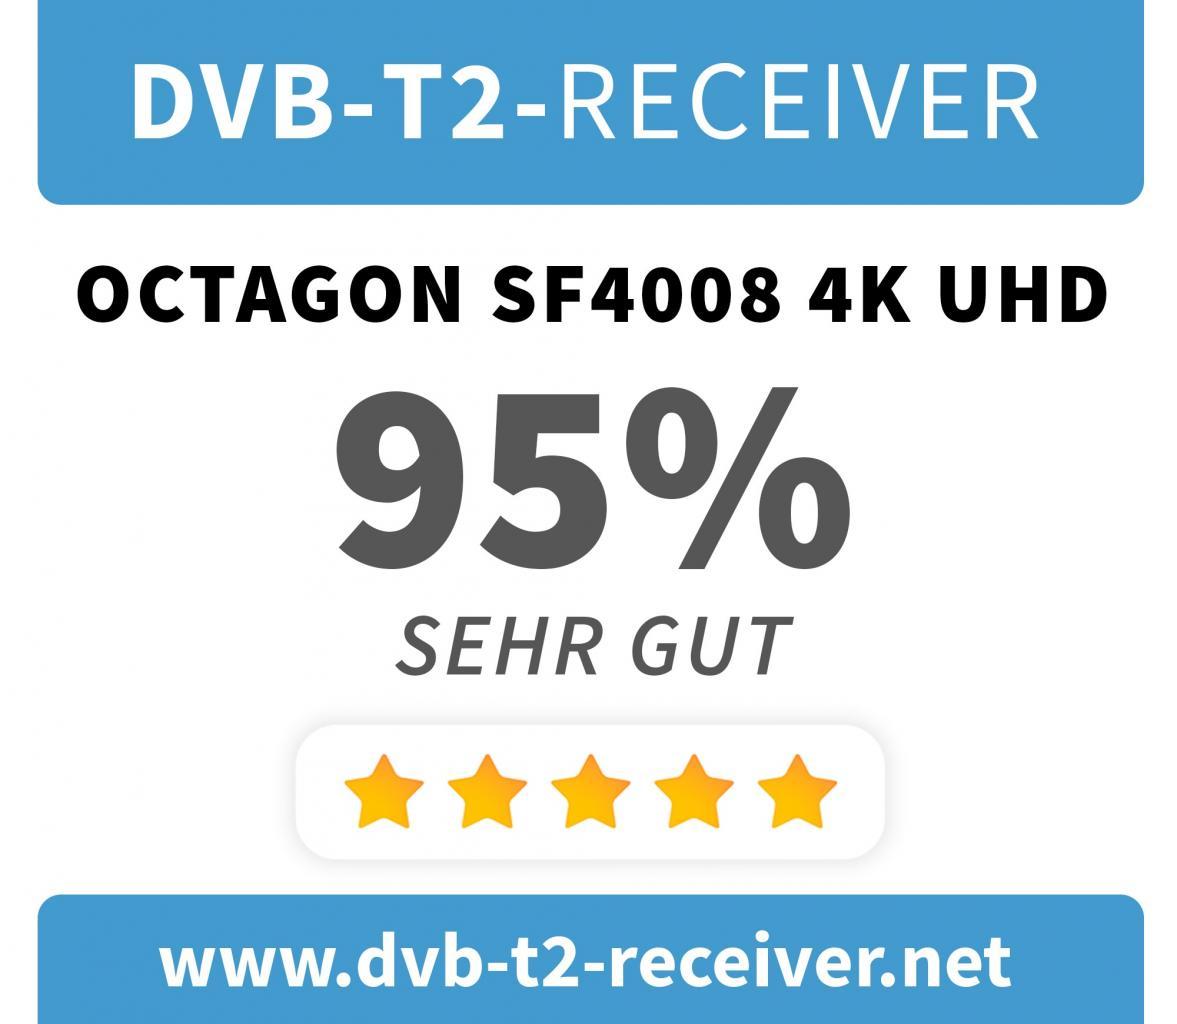 OCTAGON SF4008 4K UHD - VK Marktpreise-42000-siegel_2-2_20170217_145344.jpg